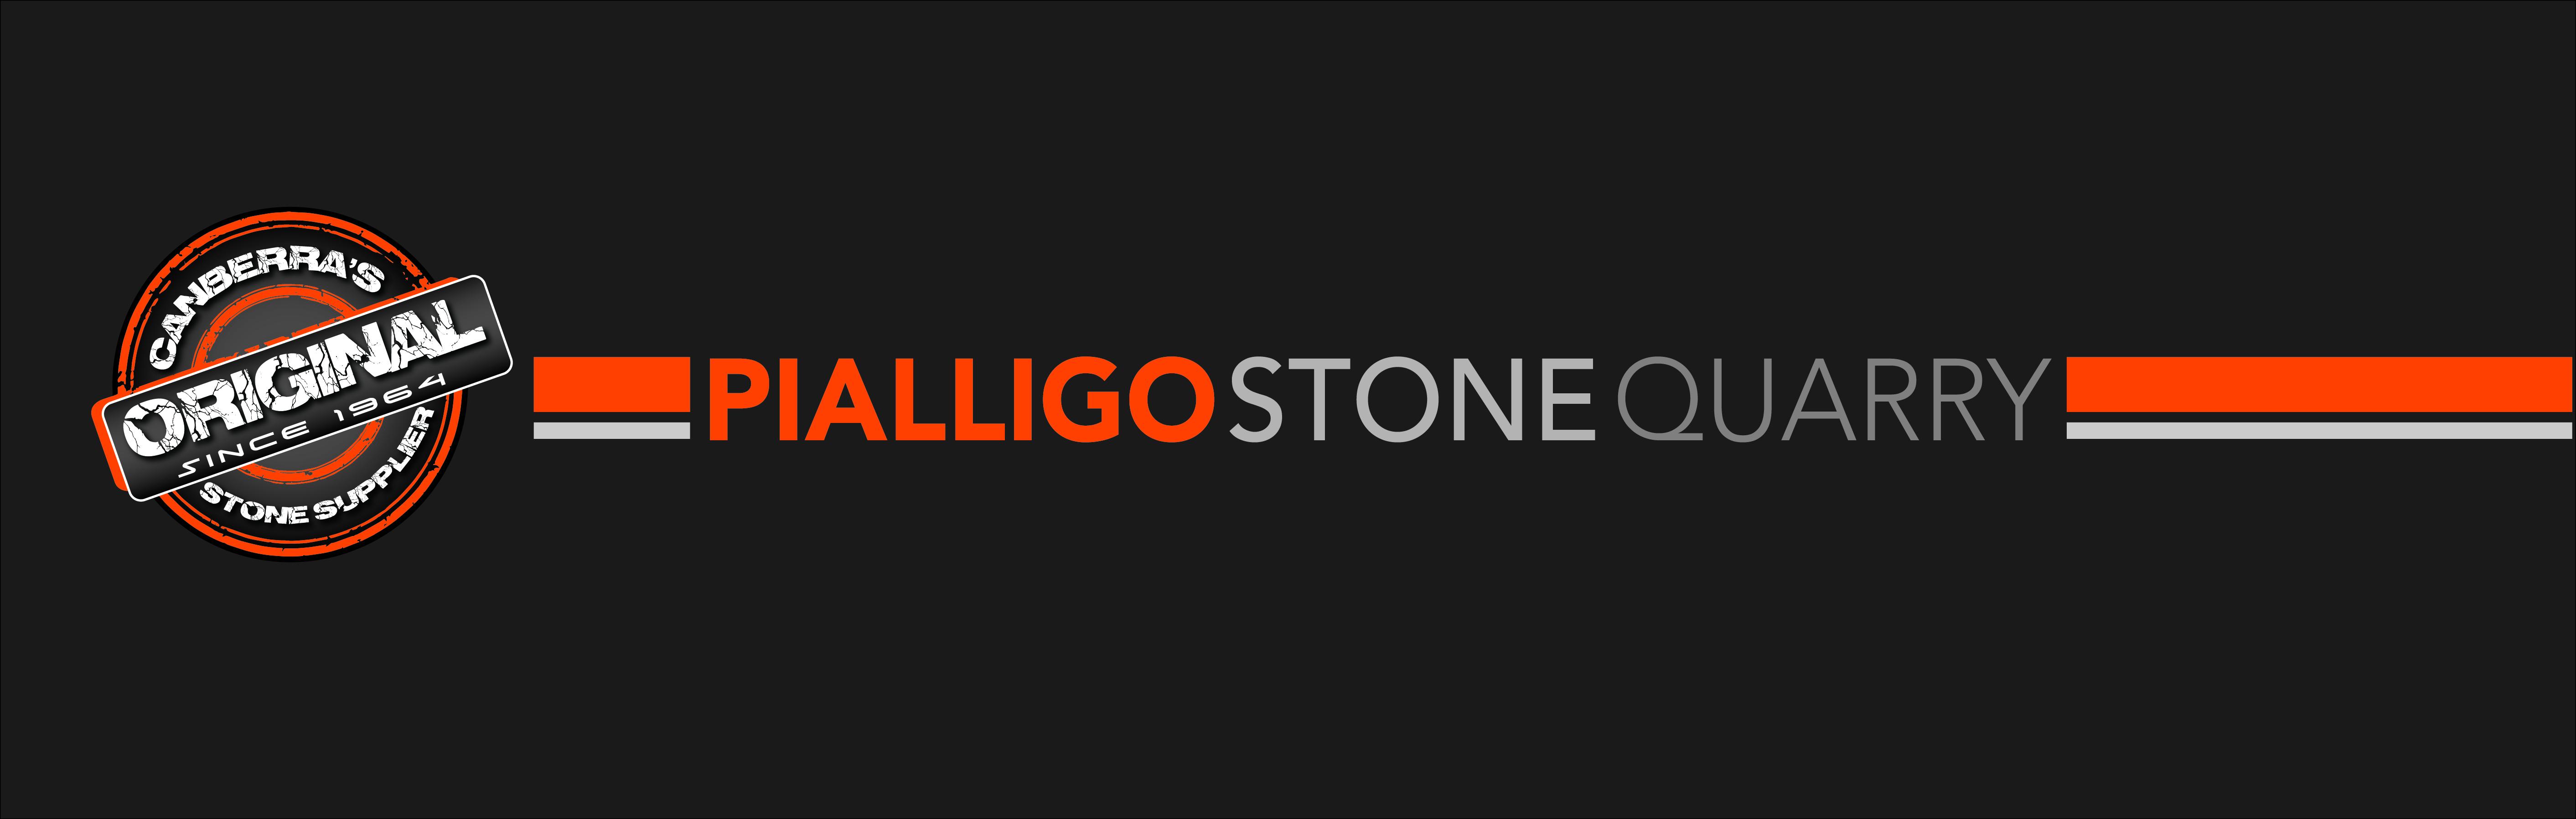 NEW Pialligo Logo.